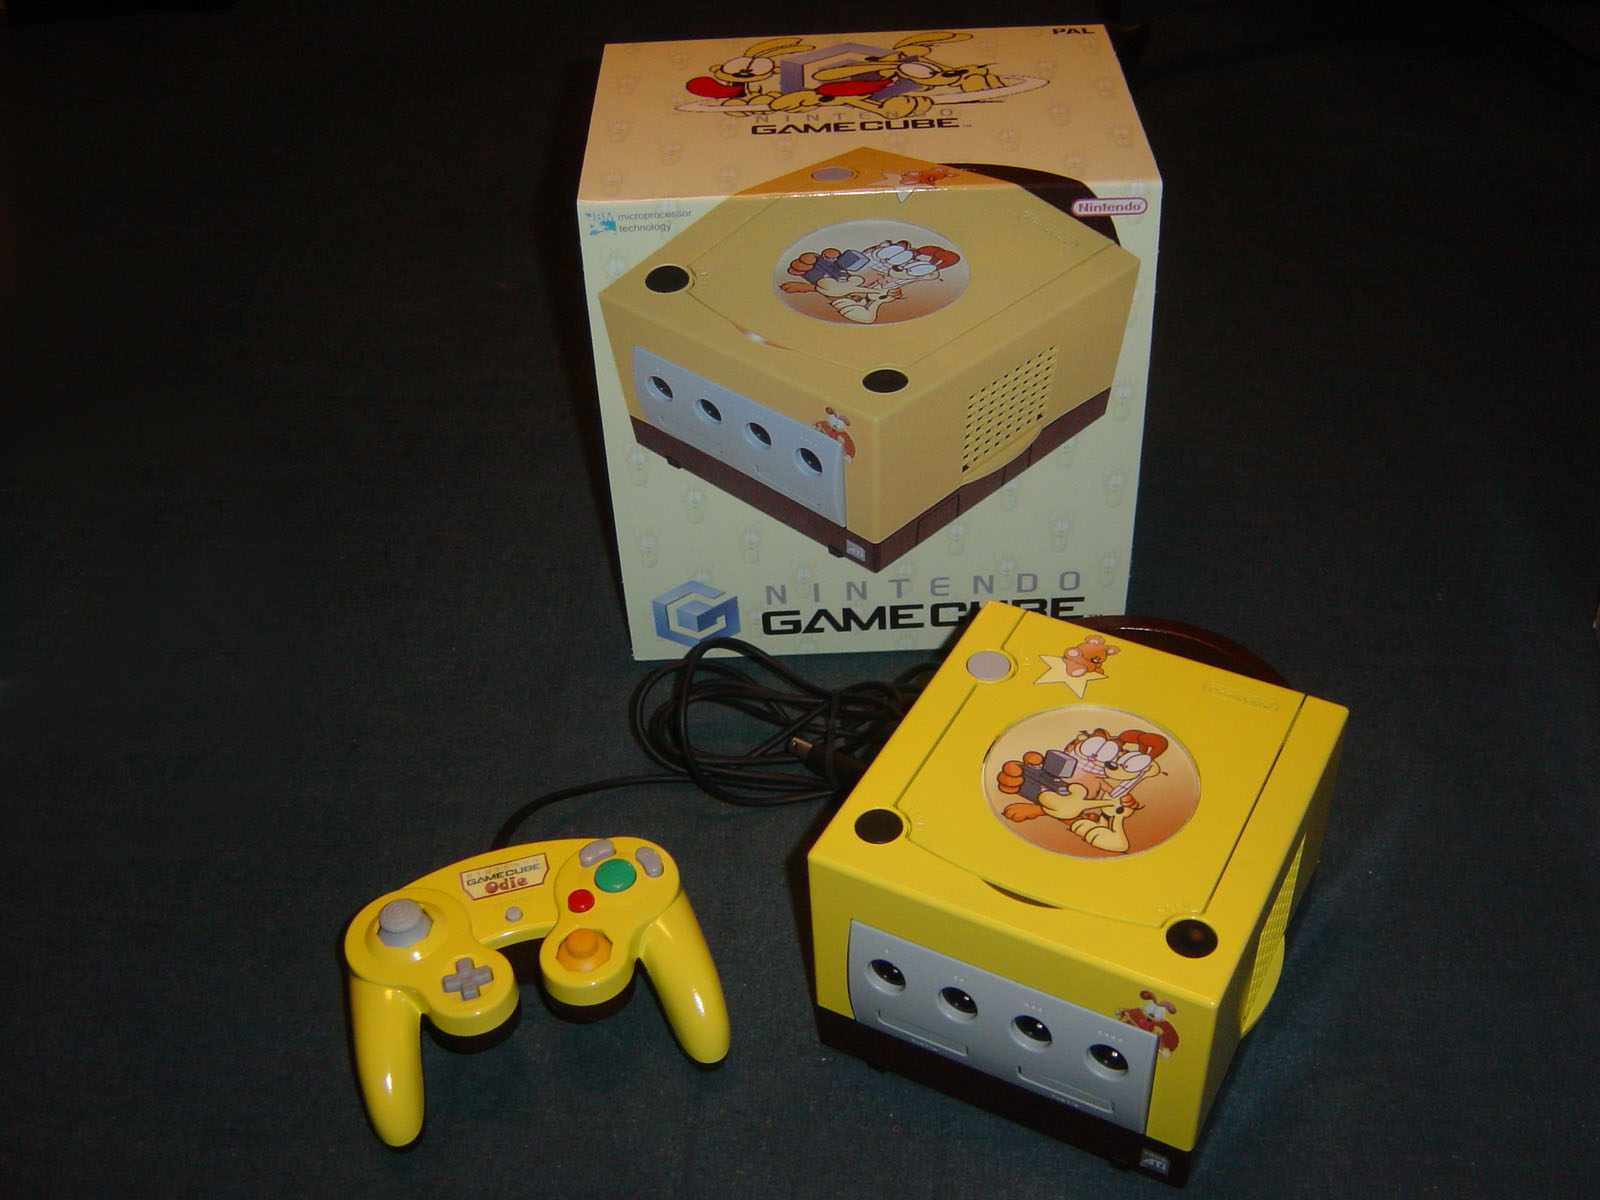 La Gamecube - Page 5 GameCube_GarfieldDSC00747